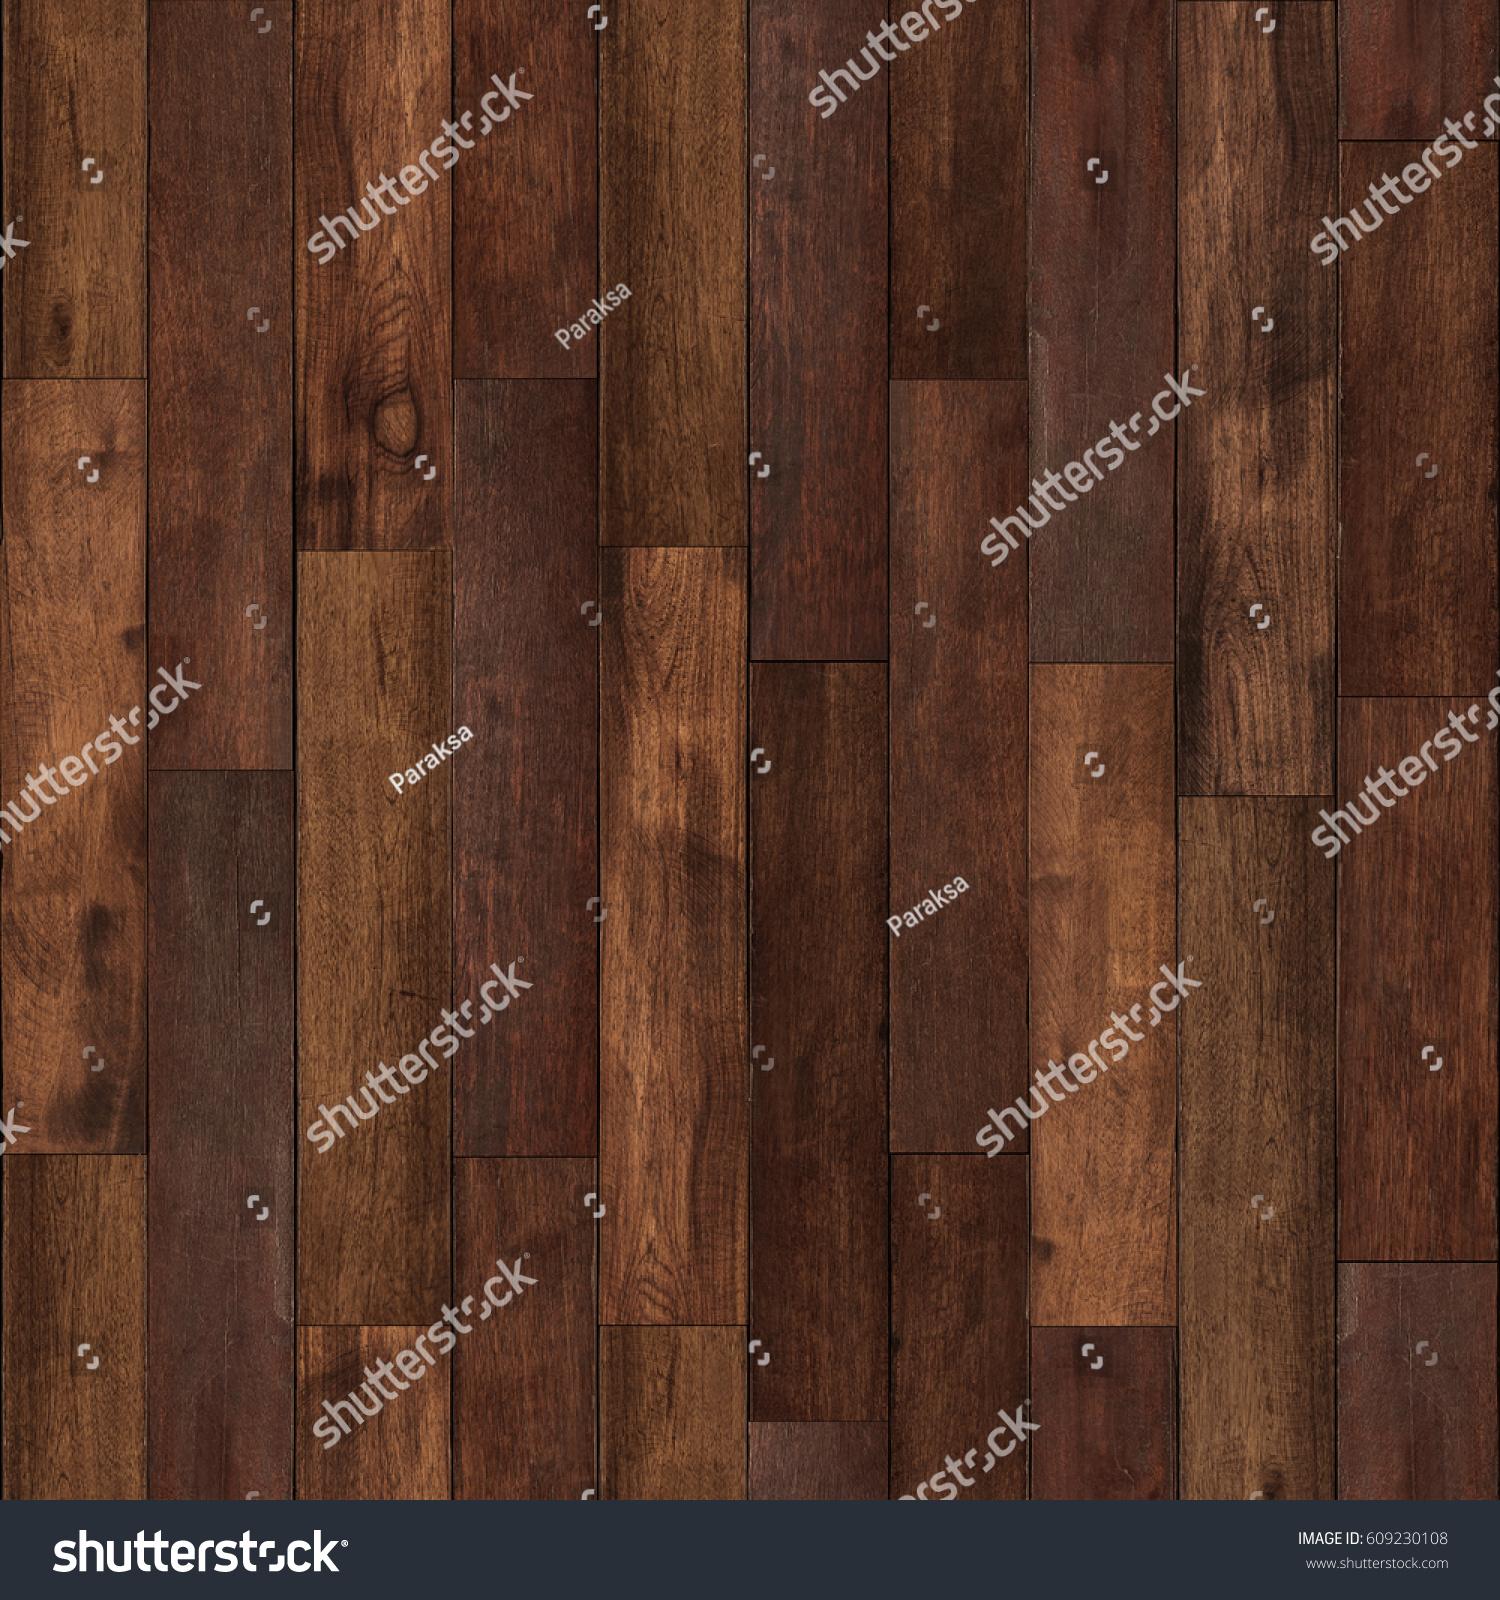 wood floor texture seamless. Wood floor texture  Seamless wood planks background Floor Texture Planks Stock Photo 100 Legal